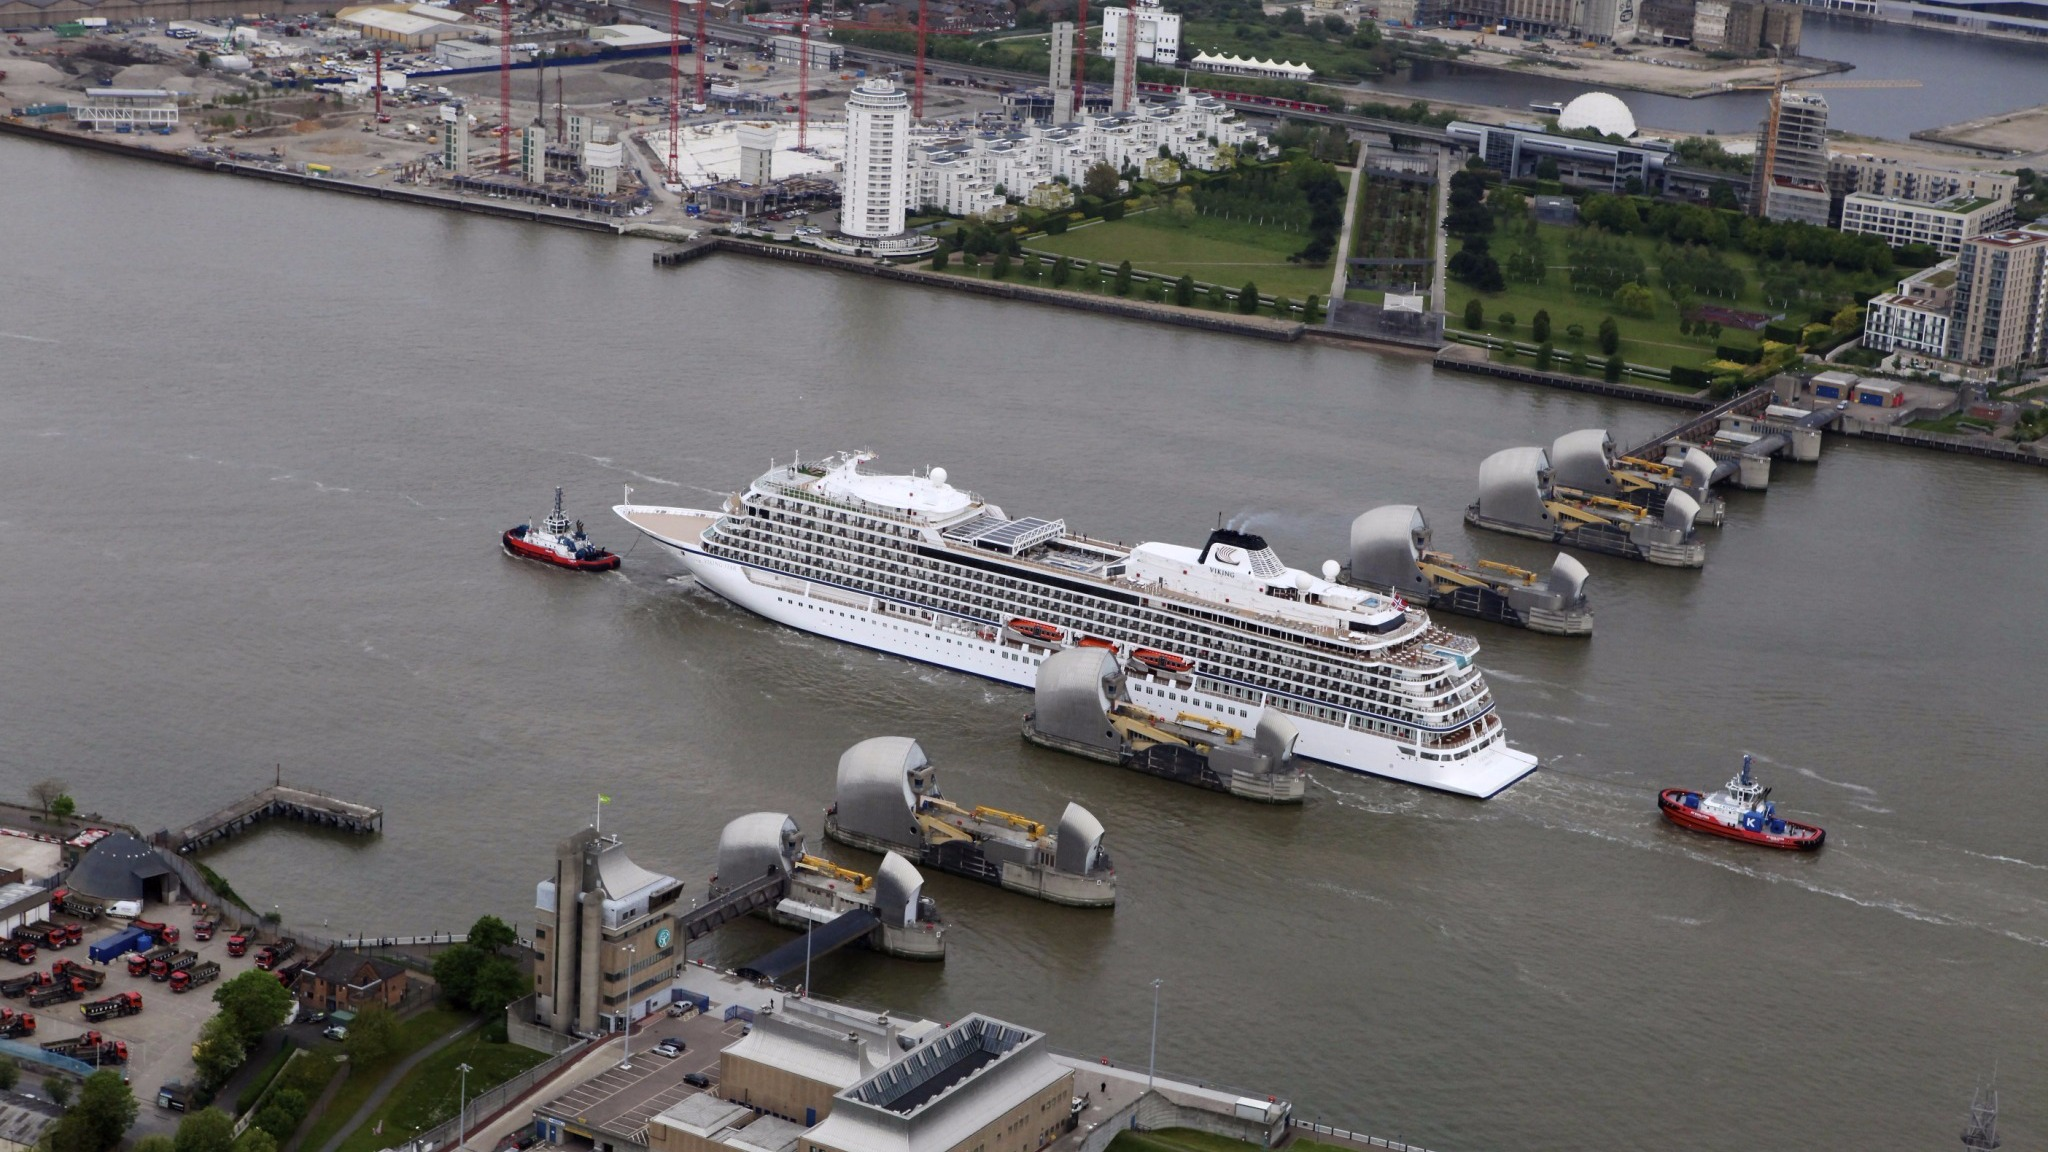 47 800 Tonne Cruise Ship Squeezes Through The Thames